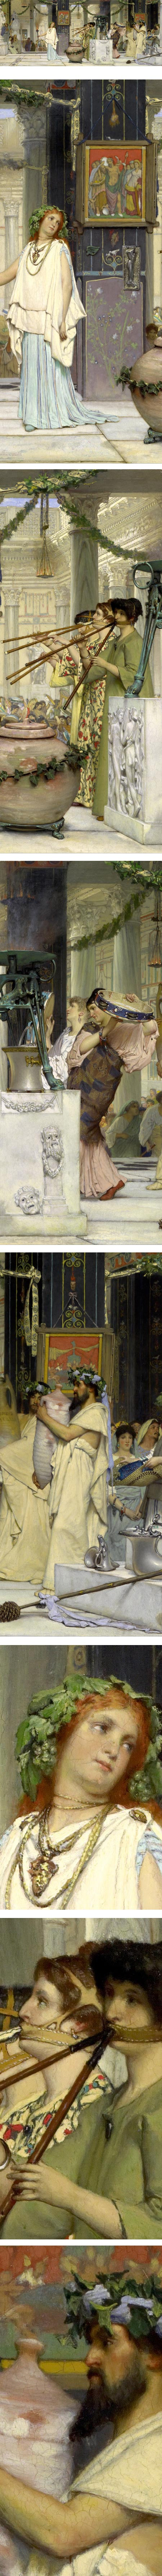 The Vintage Festival, Lawrence Alma-Tadema